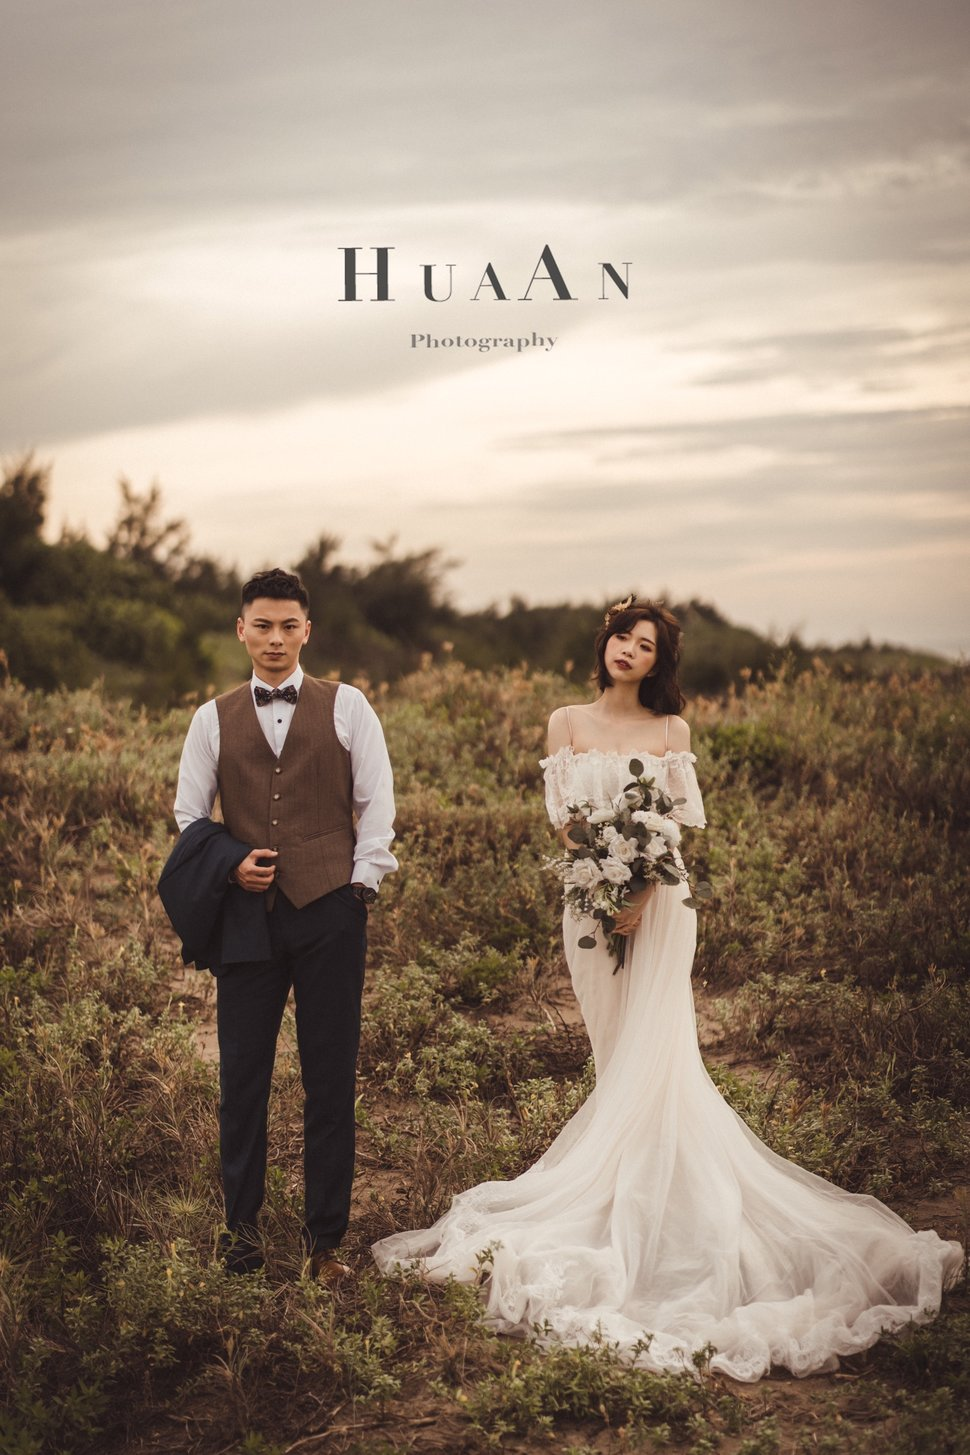 2D76331B-3F64-431F-AF00-733363EB72E6 - Huaan Photography《結婚吧》